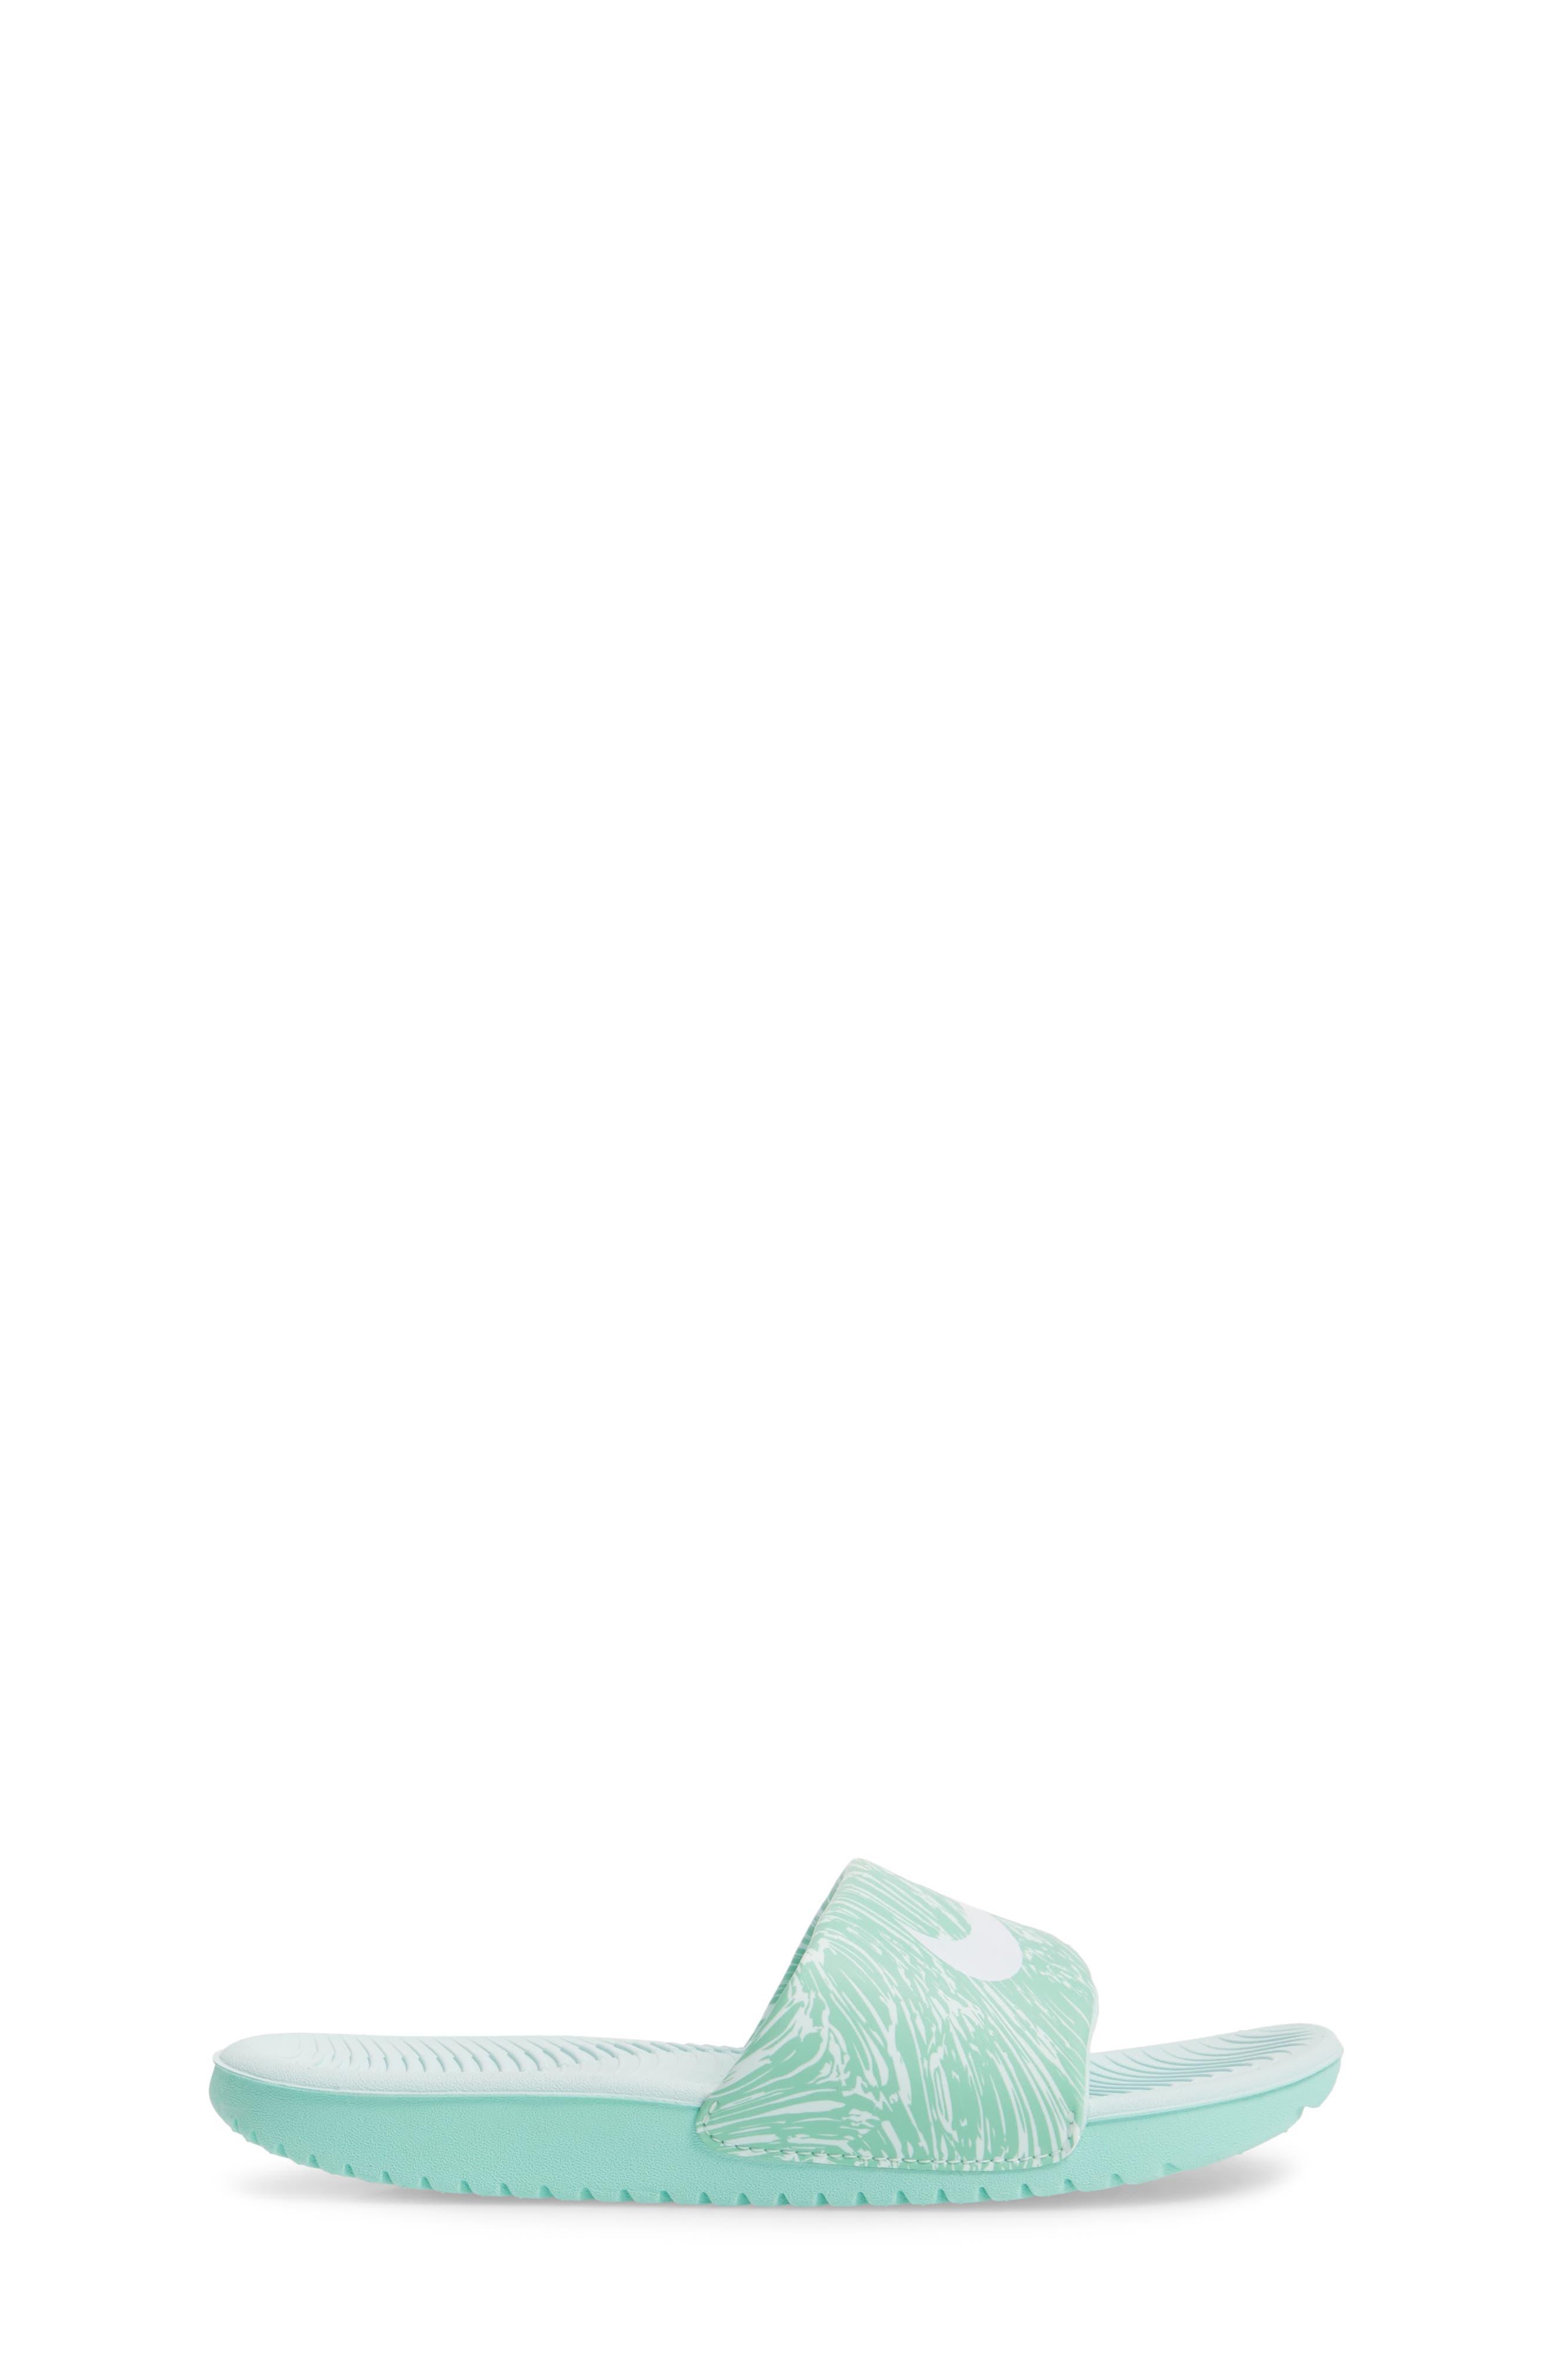 'Kawa' Print Slide Sandal,                             Alternate thumbnail 13, color,